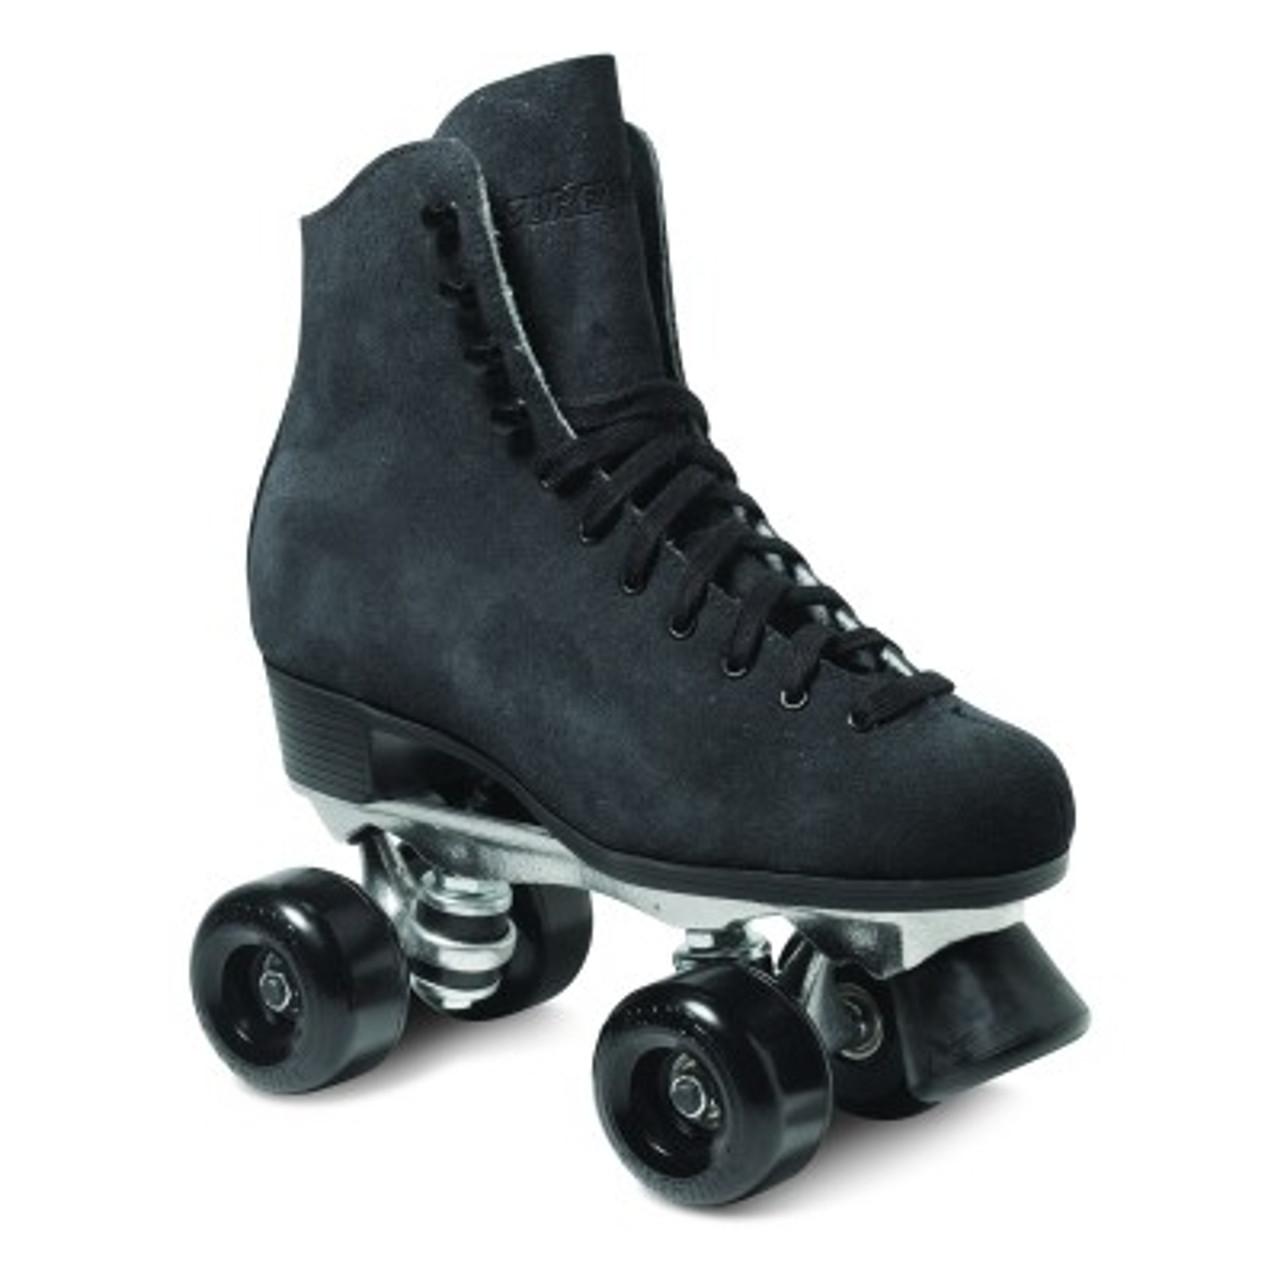 suede roller skate boots